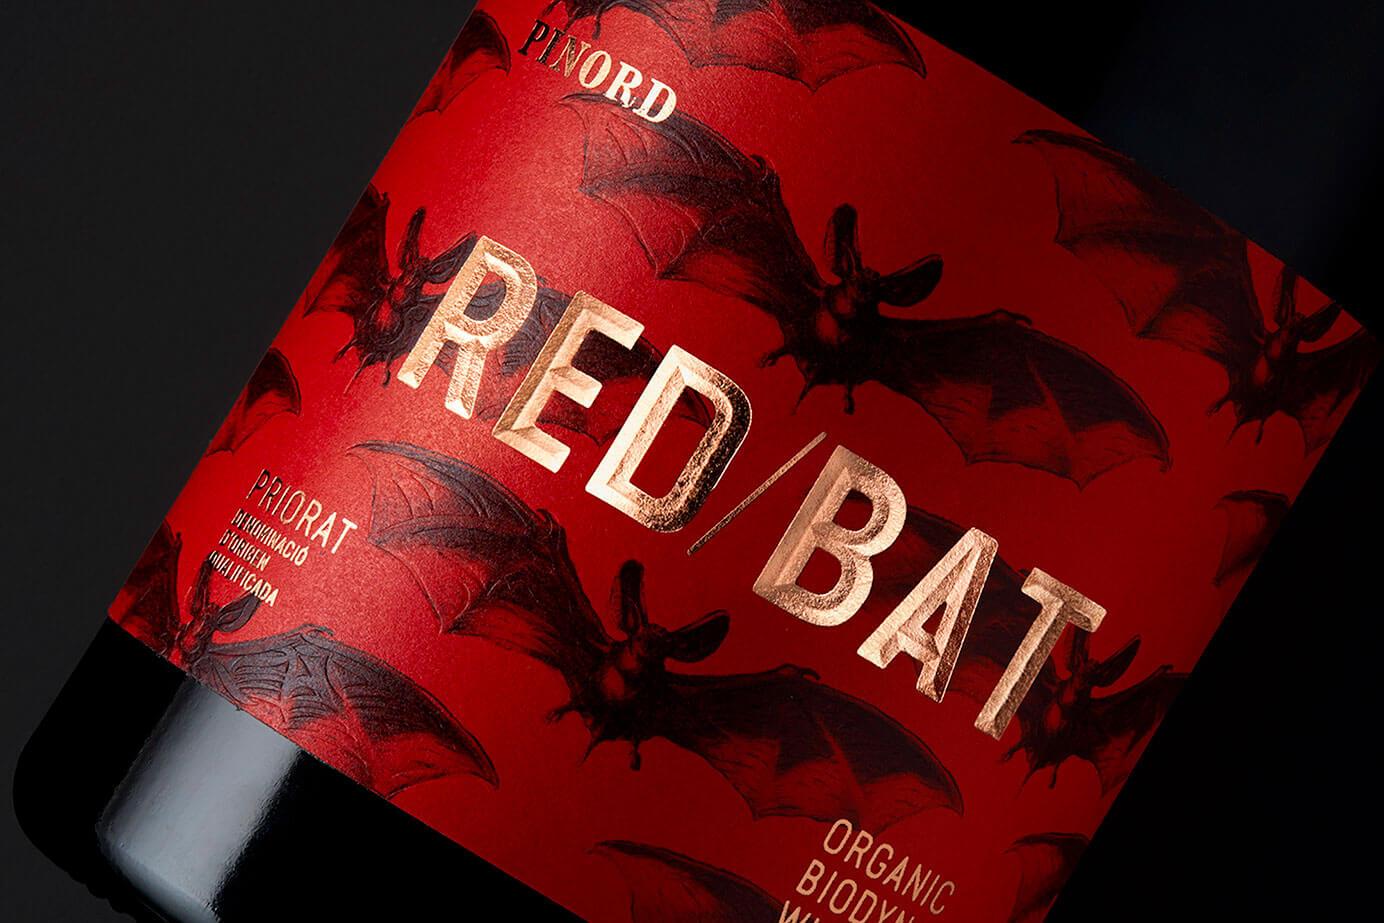 Detalle del logotipo de la etiqueta del vino biodinámico Red Bat.